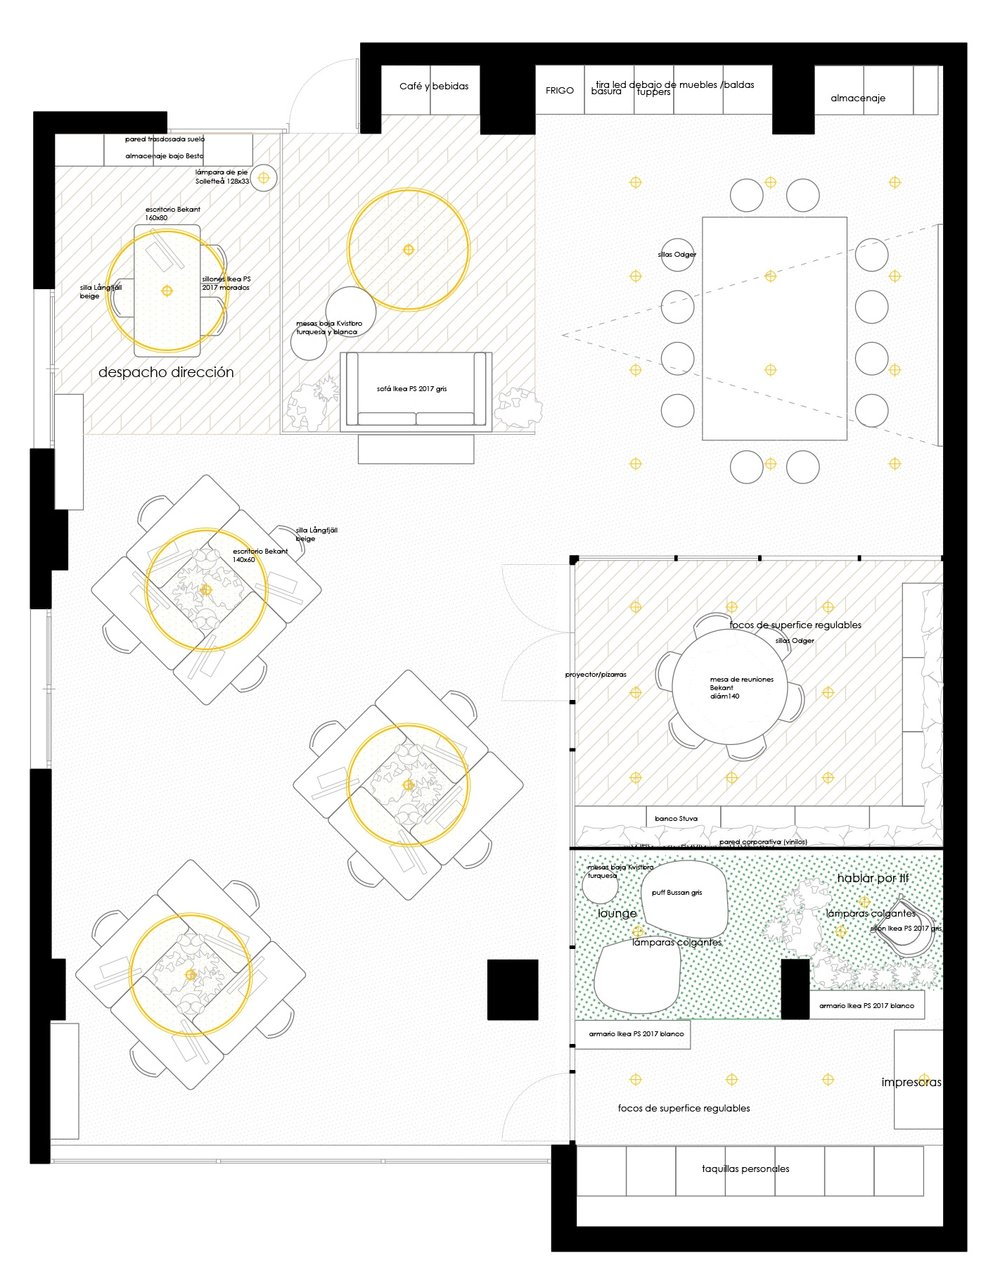 emmme studio blog desde babia living lab UPM plano proyecto.jpg